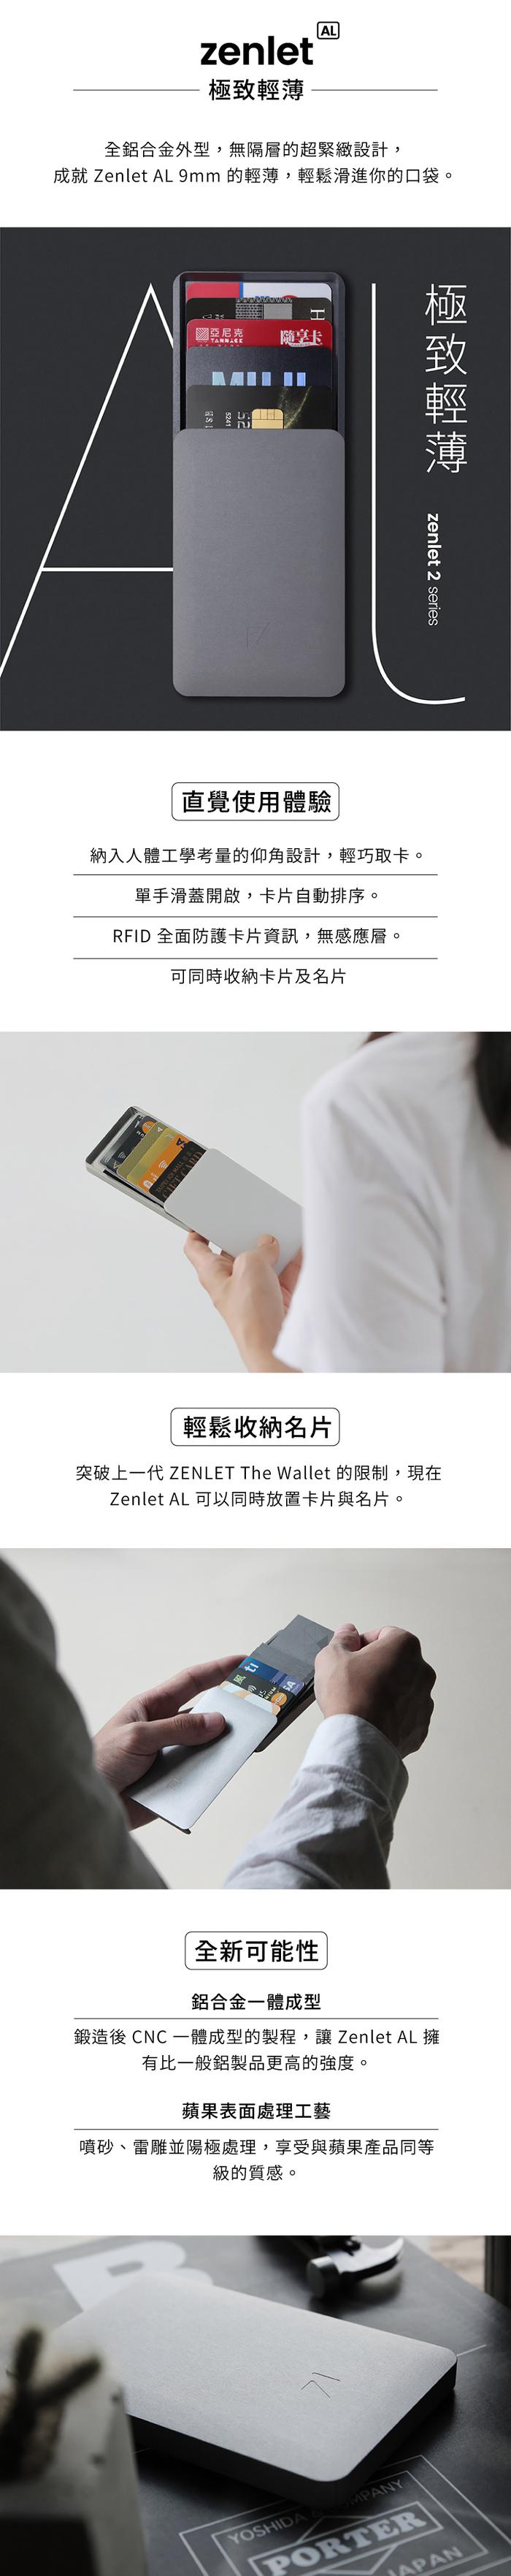 ZENLET|The Ingenious Wallet 行動錢包 2 series - AL 極致輕薄